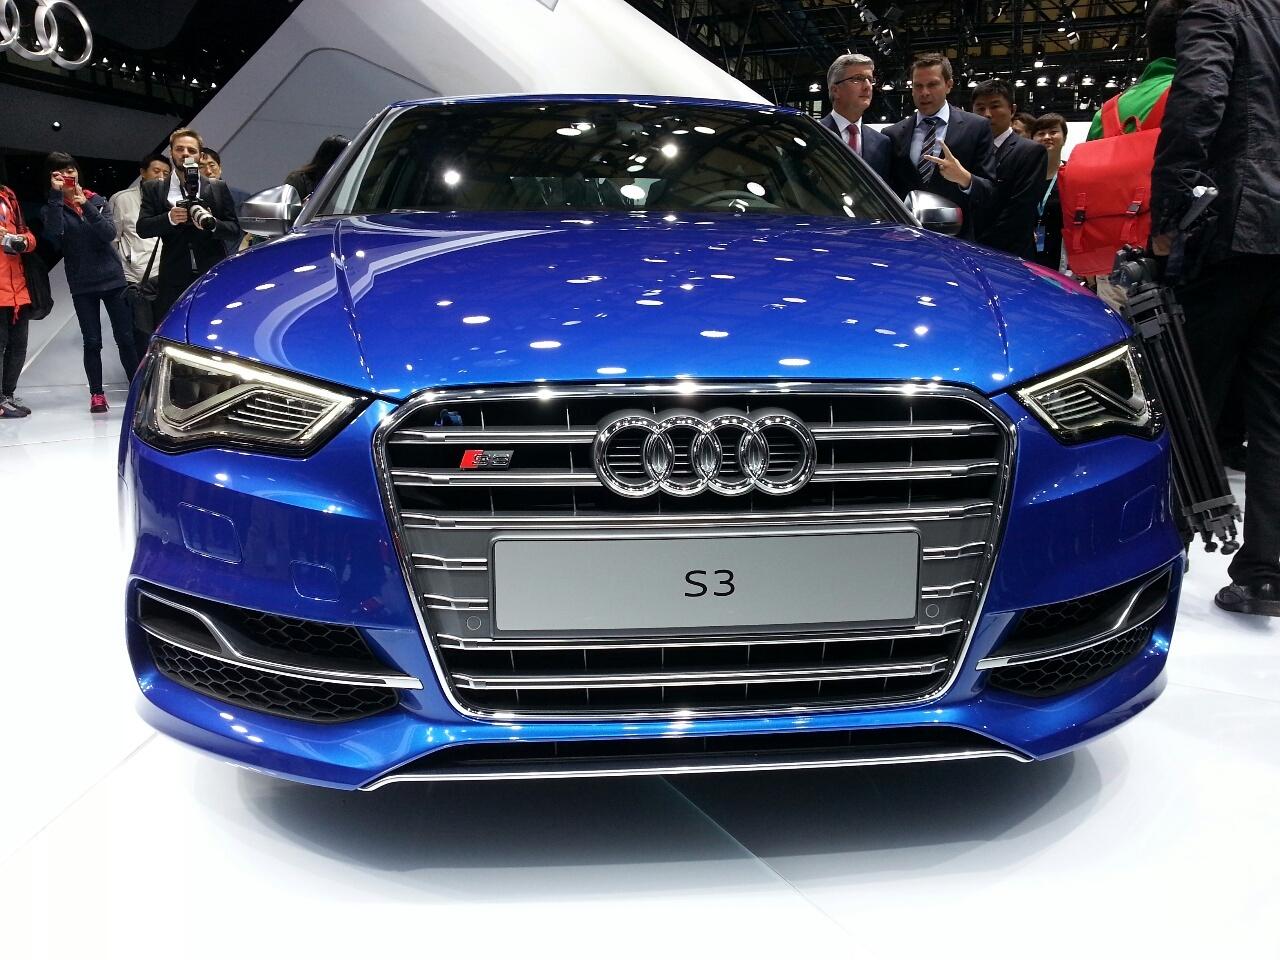 2015 Audi S3 Sedan Facelift